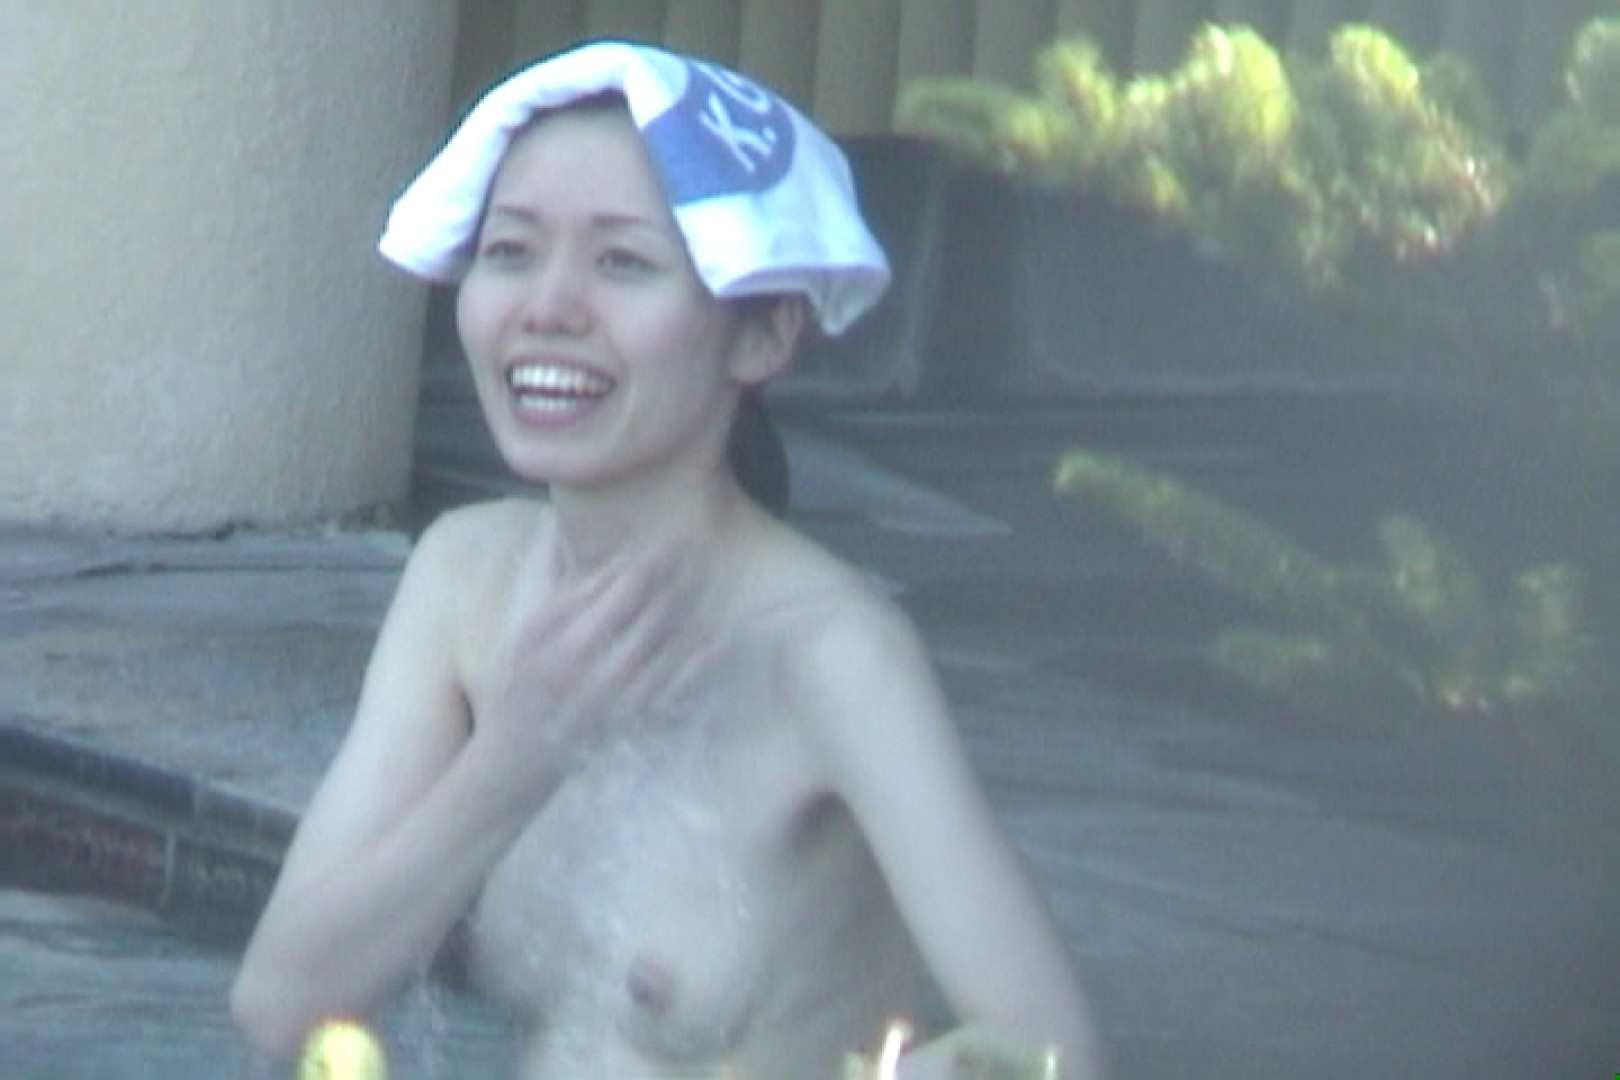 Aquaな露天風呂Vol.576 OLすけべ画像 | 露天  20連発 10